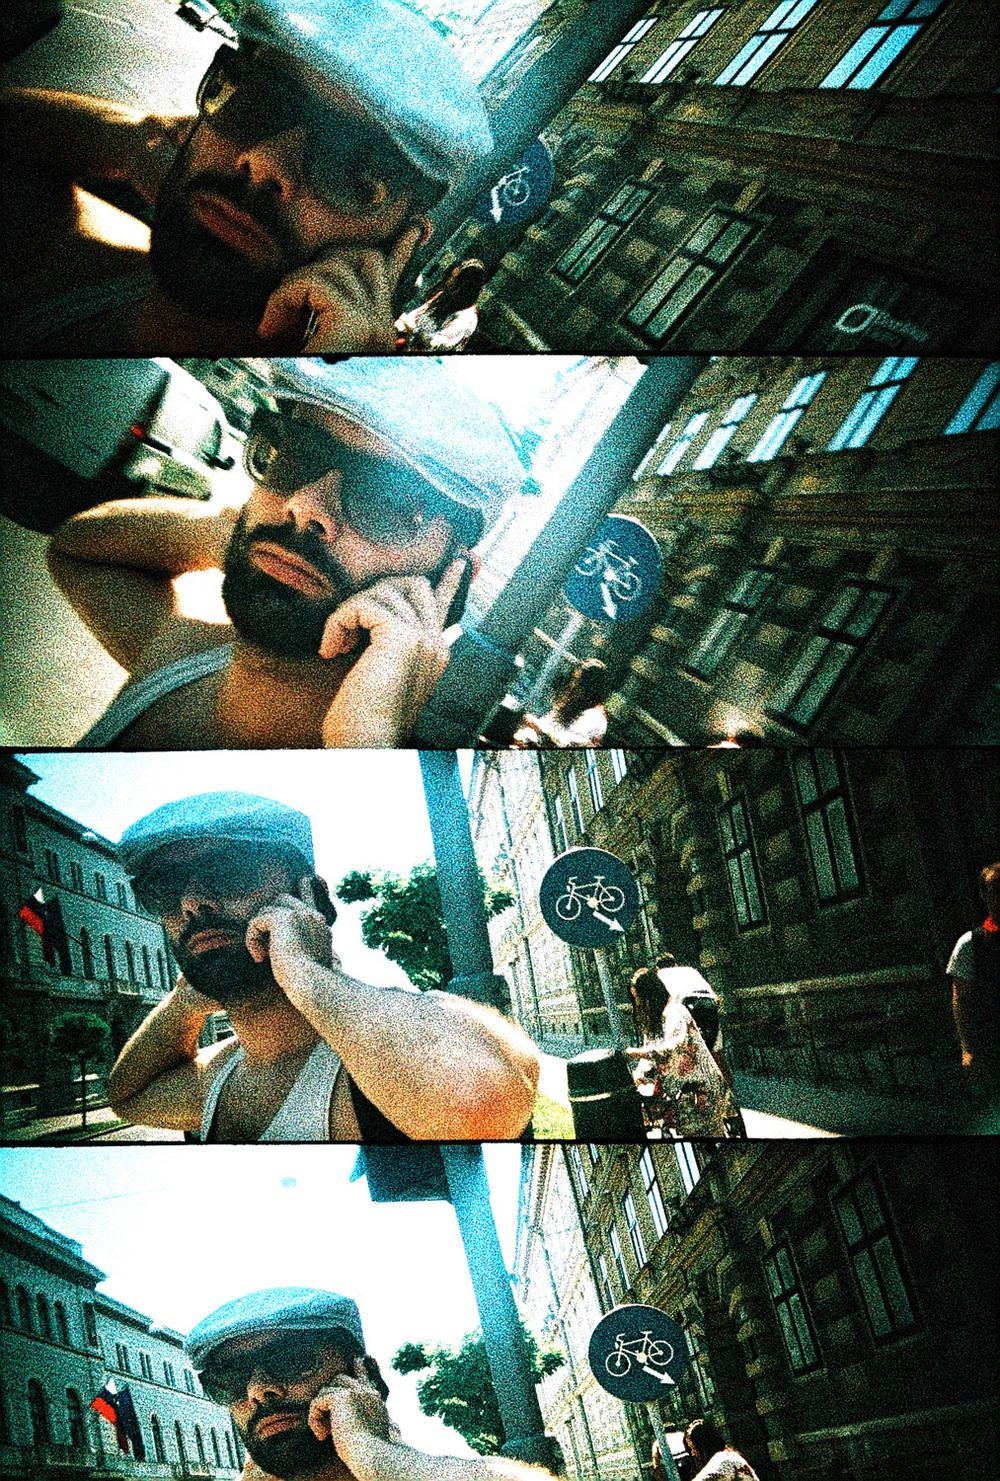 03lomography_foto_Mankica_Kranjec.jpg